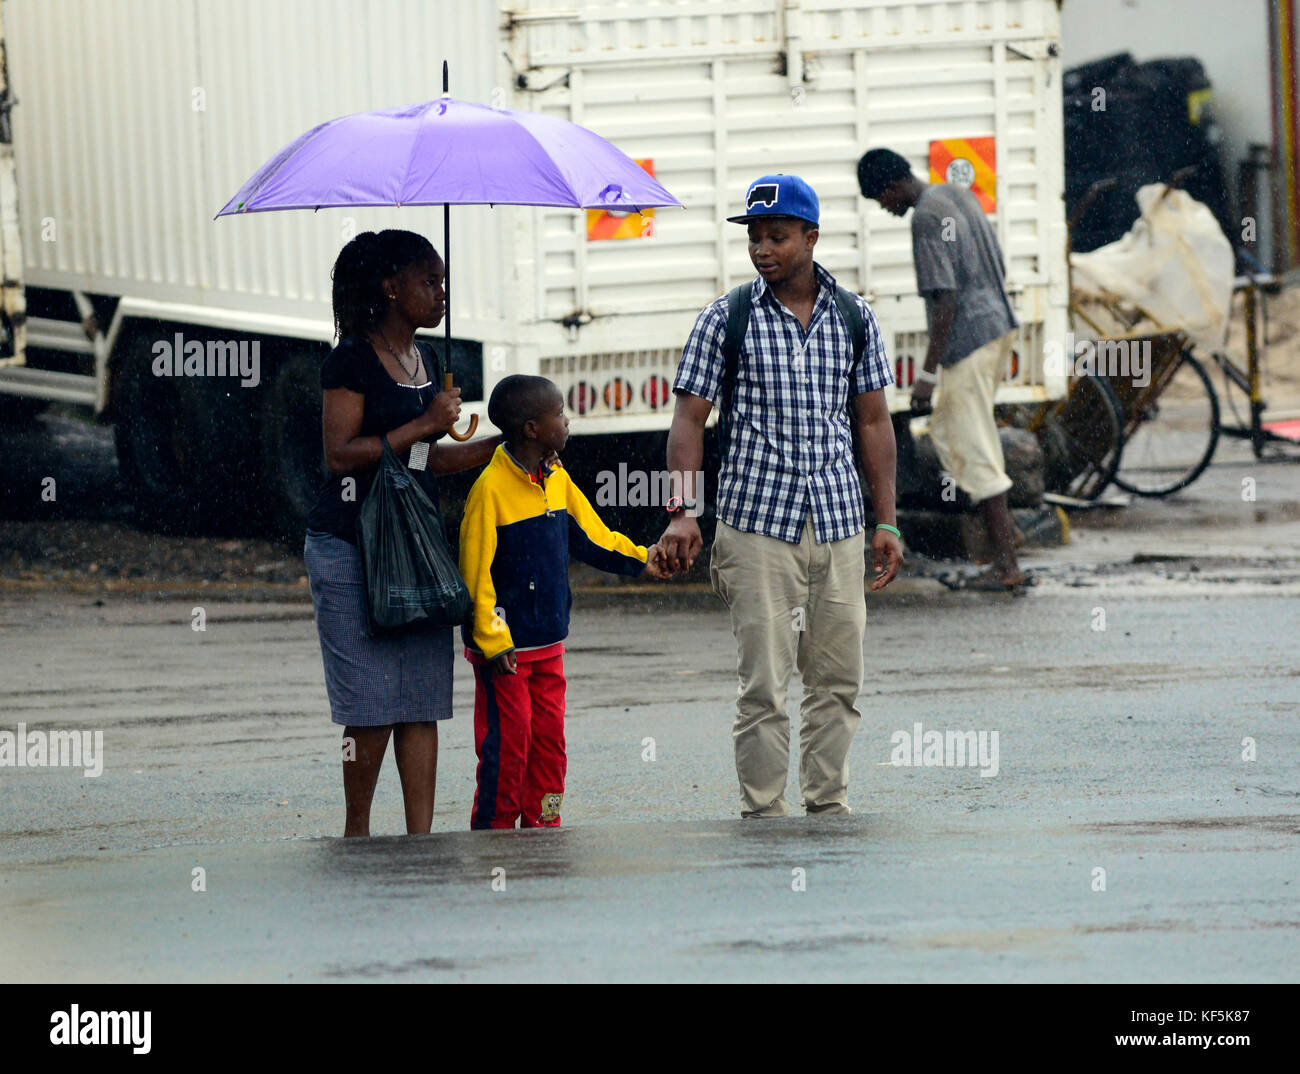 A Tanzanian family walking in the rain. - Stock Image